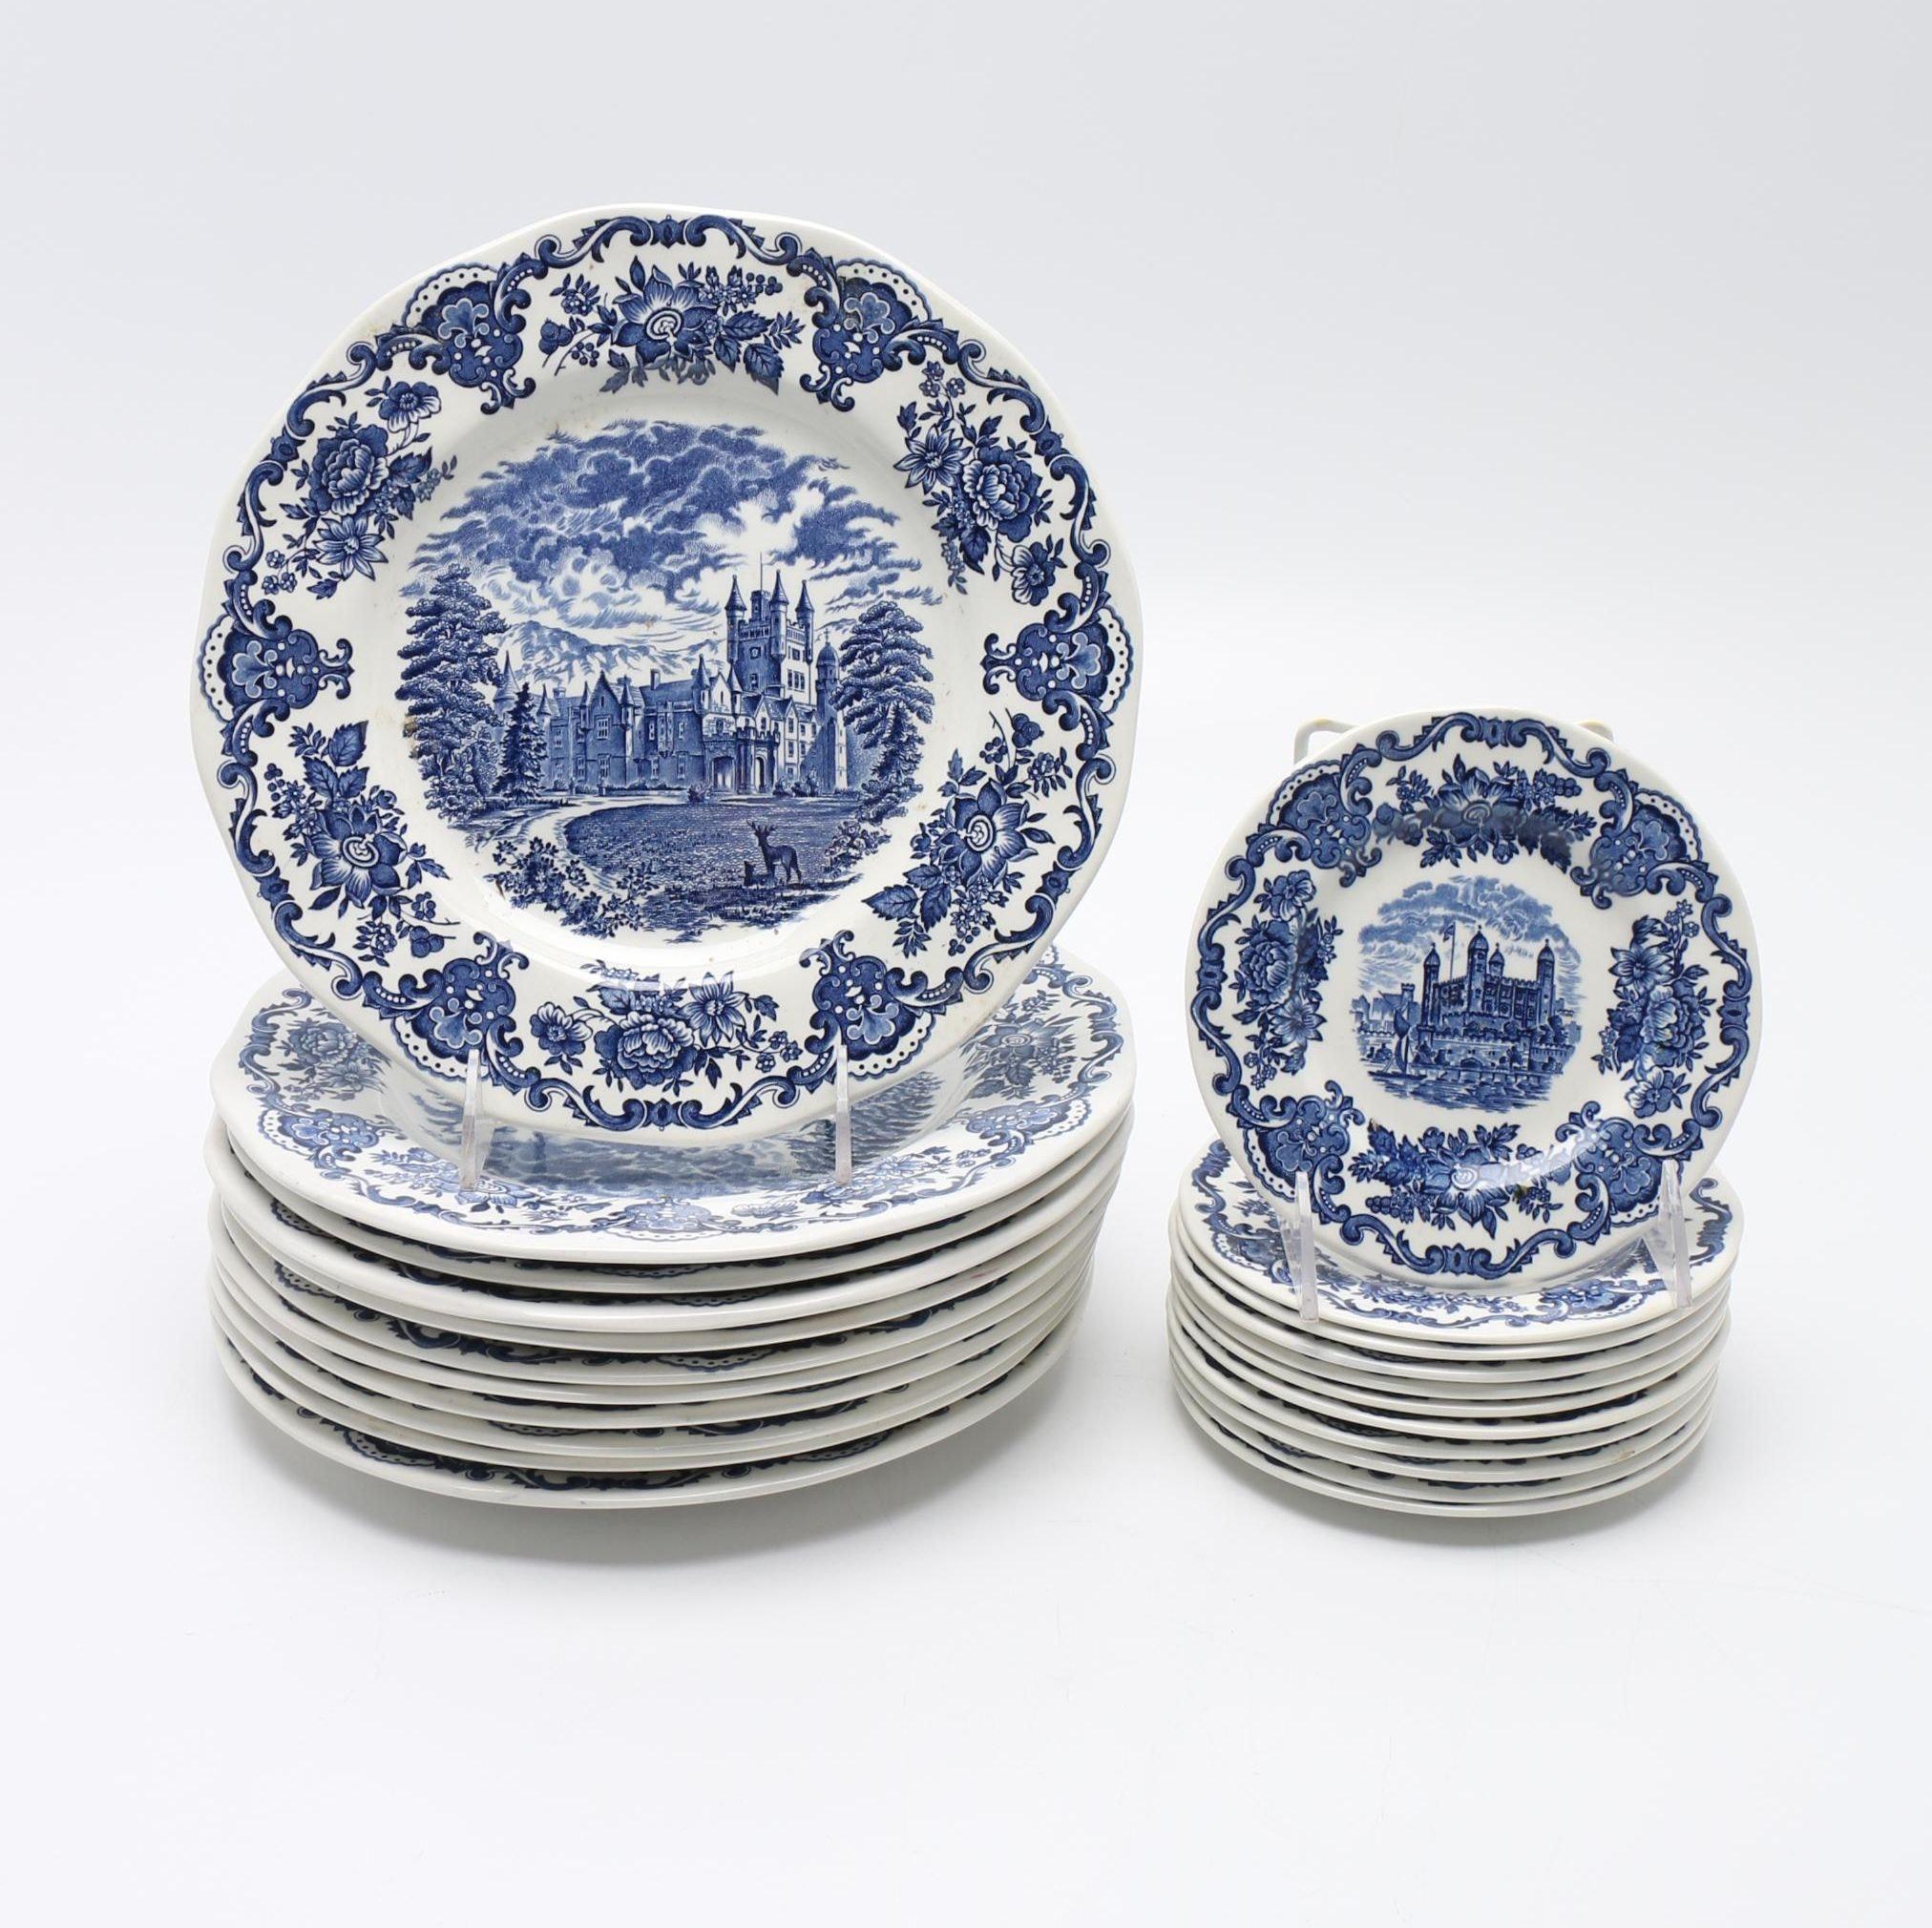 "Wedgwood ""Royal Homes of Britain"" Tableware Set"